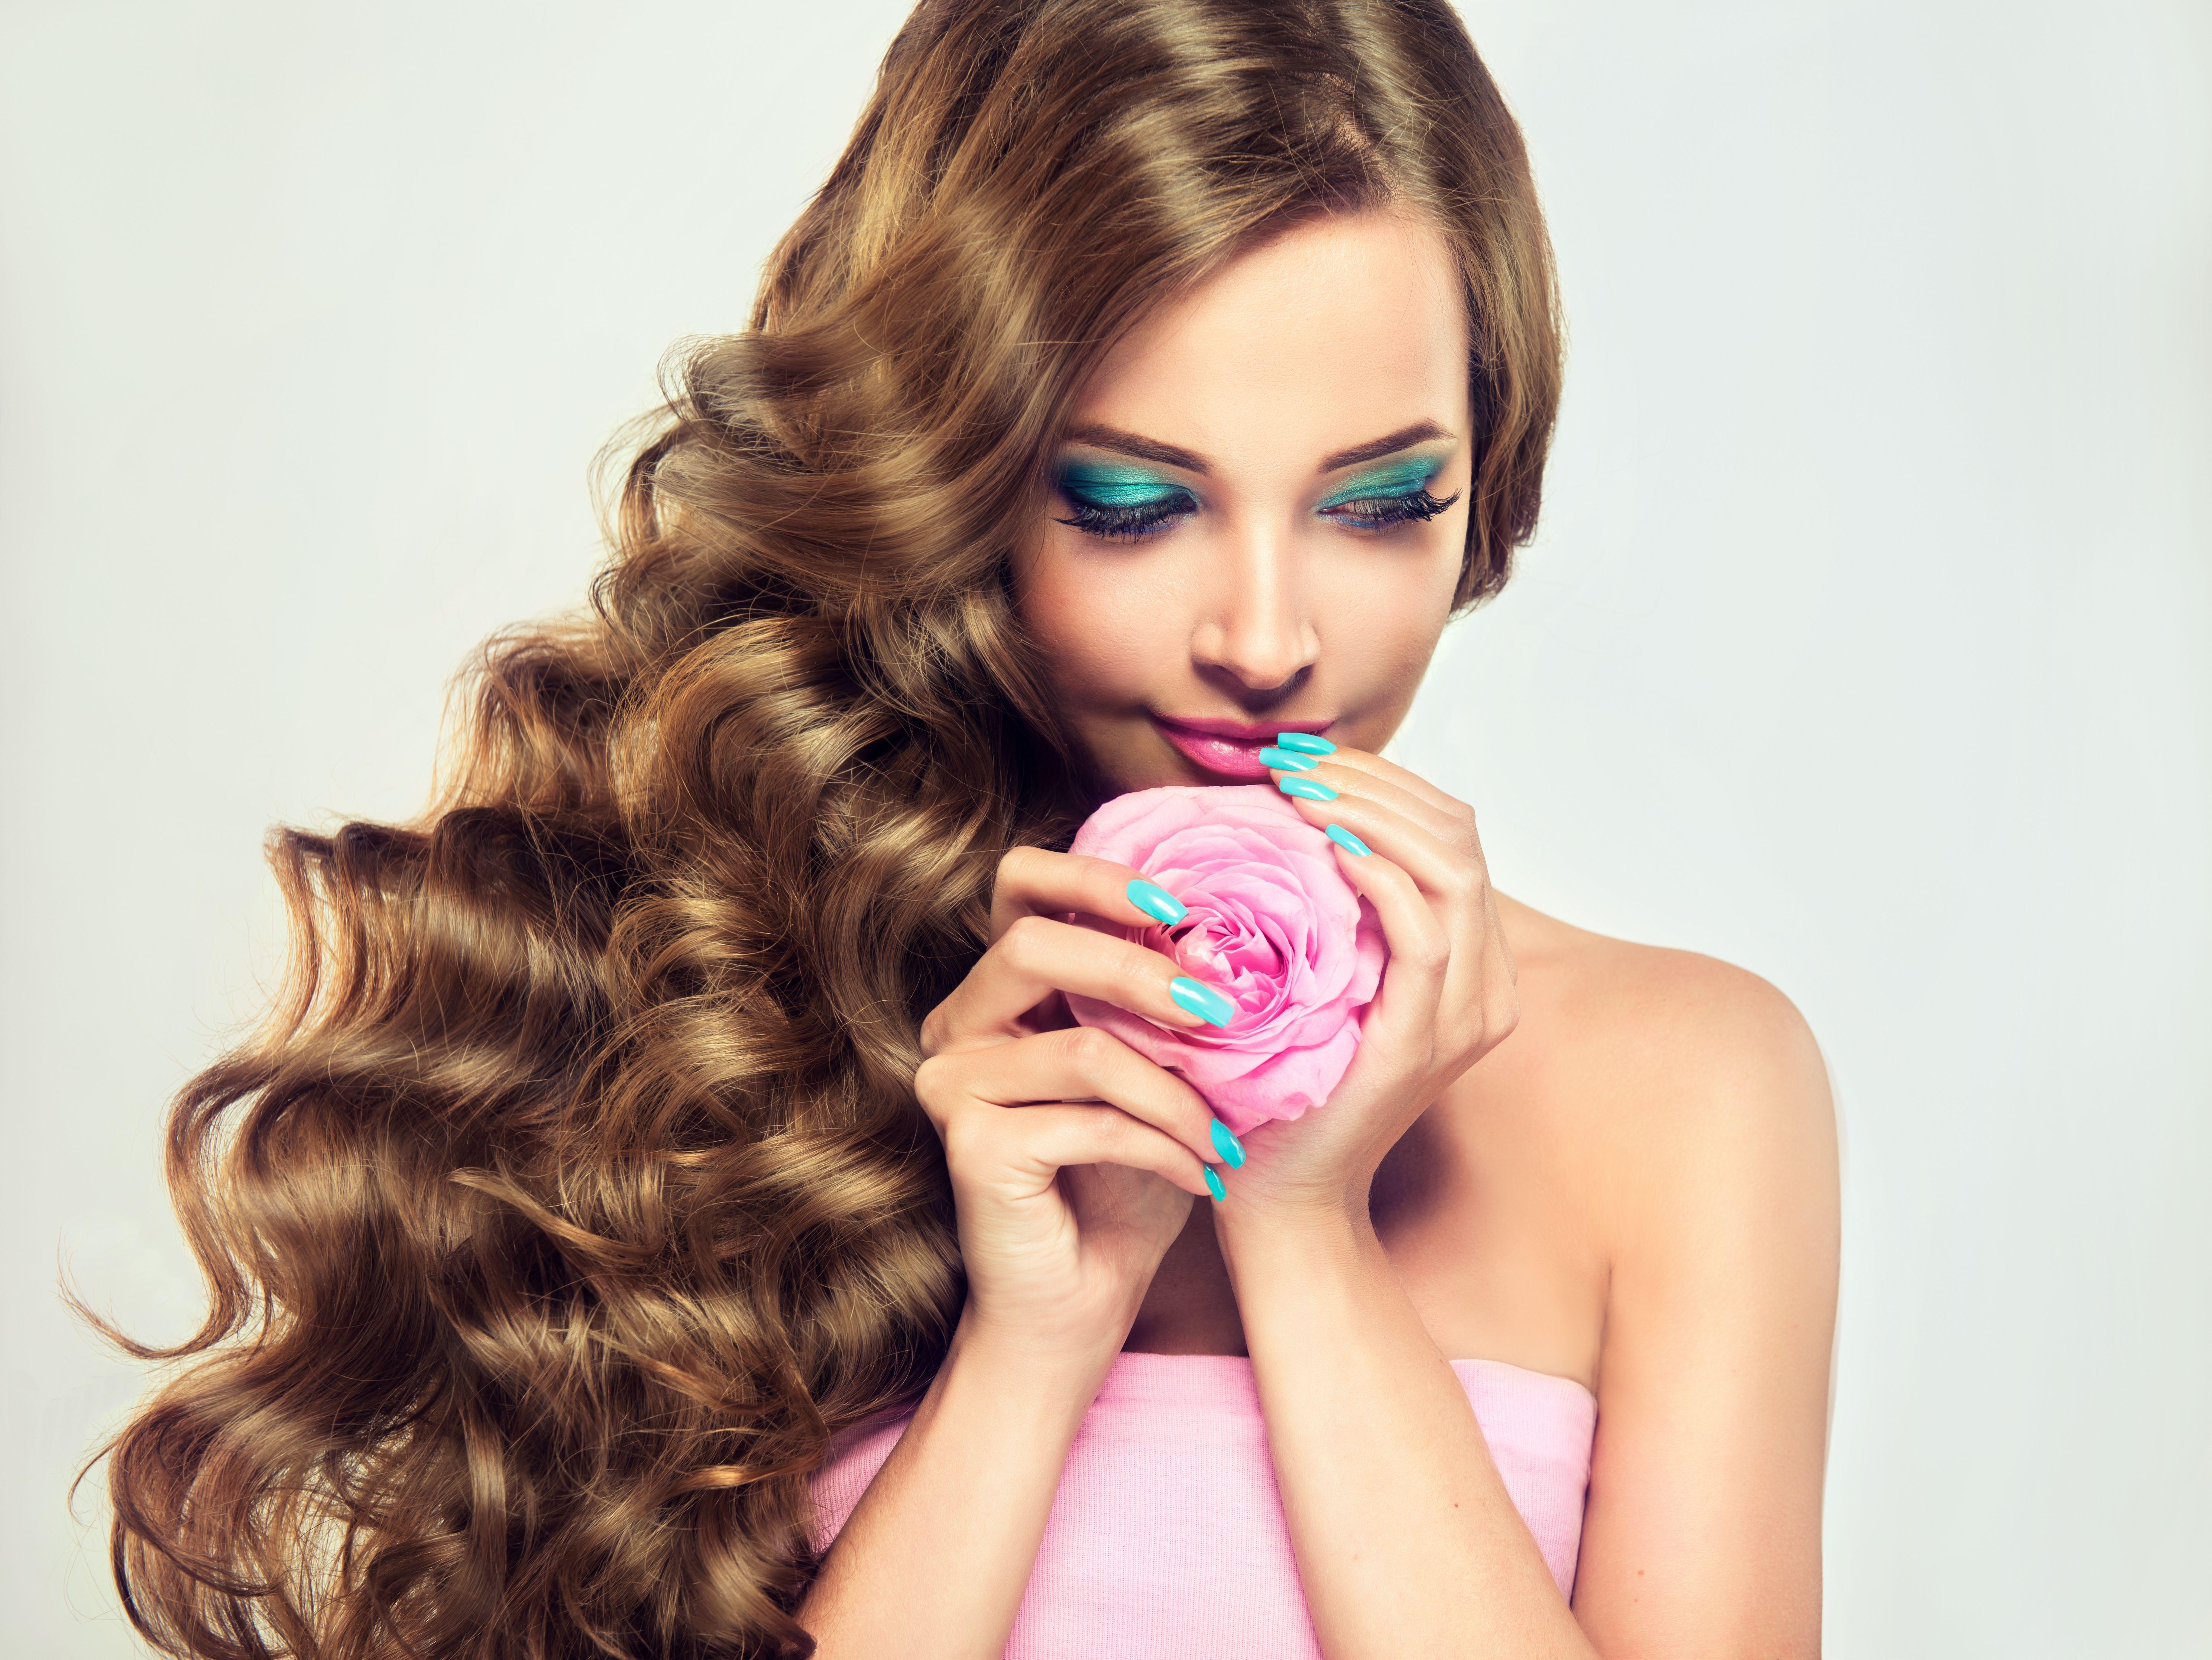 Maquillaje: Servicios de Be [ sthetic ]